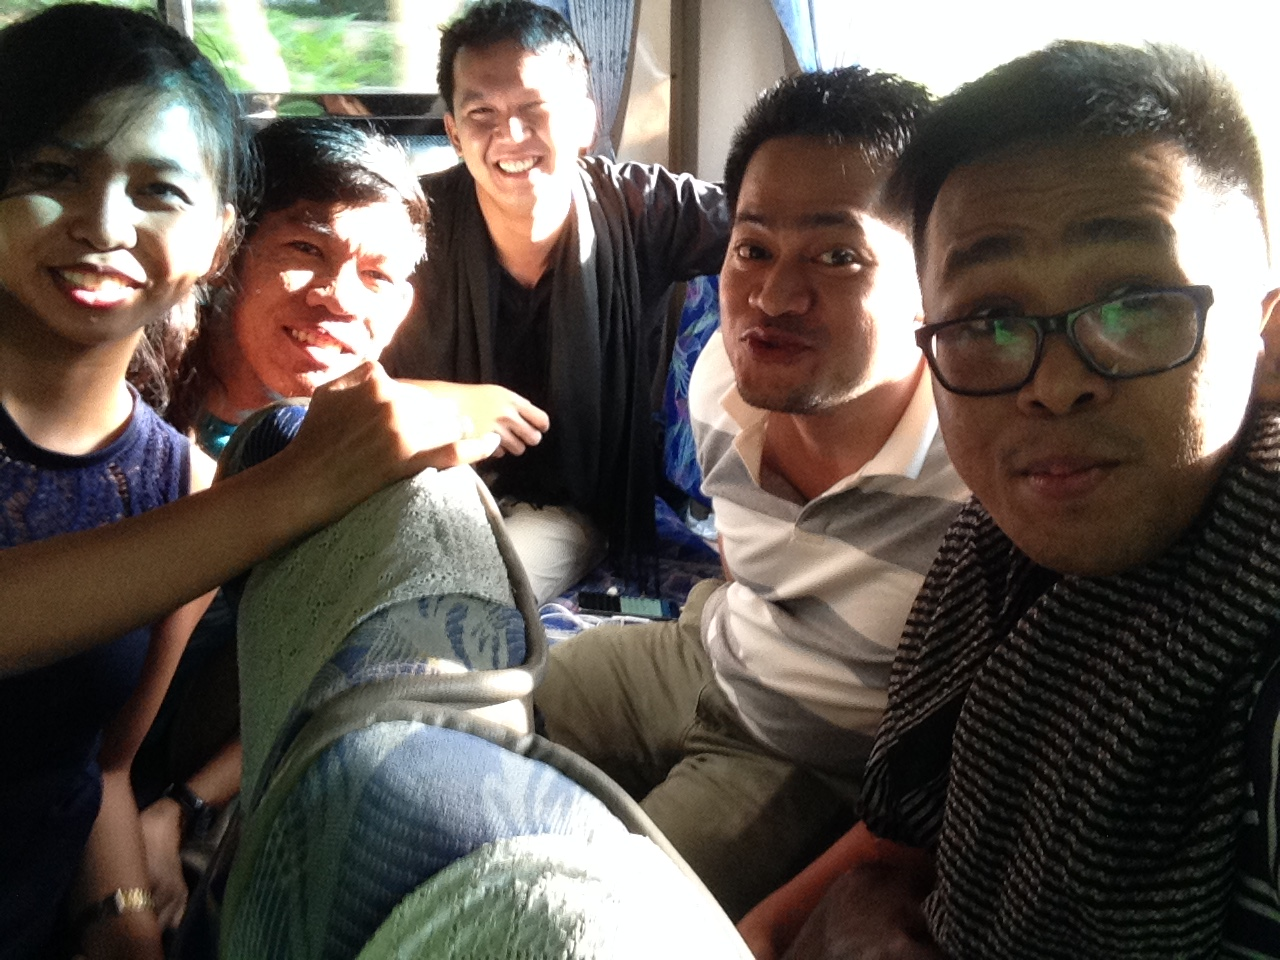 Bus back to Bangkok